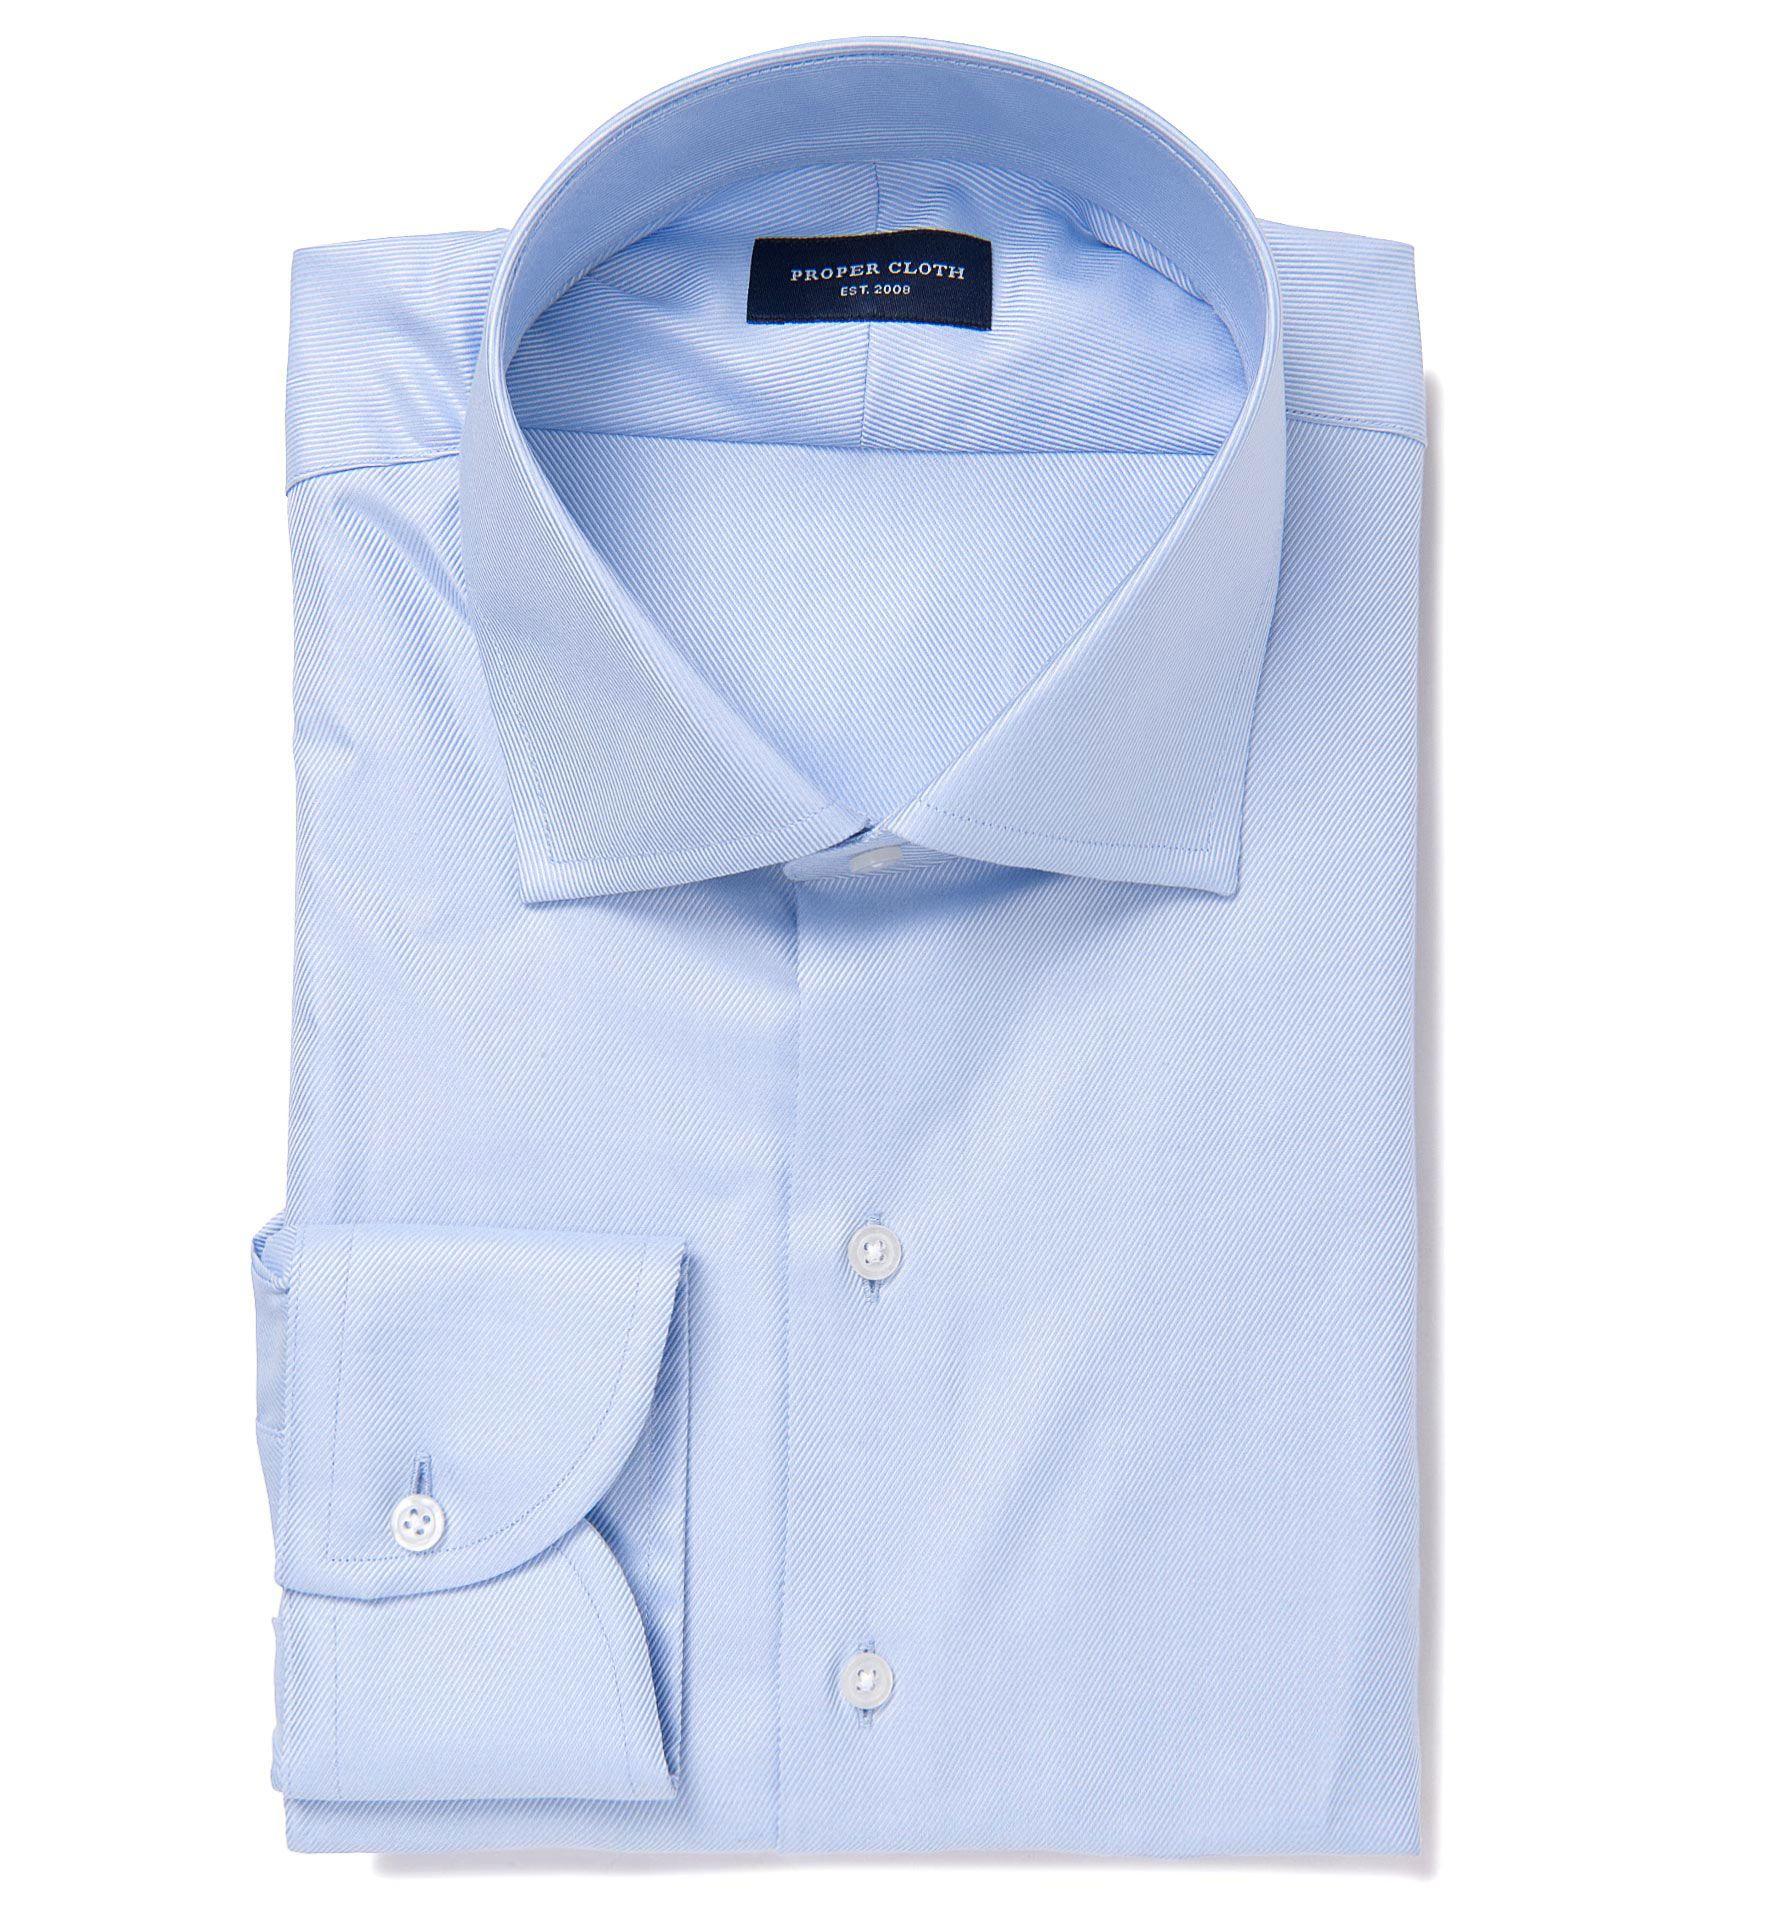 Where are proper cloth shirts made